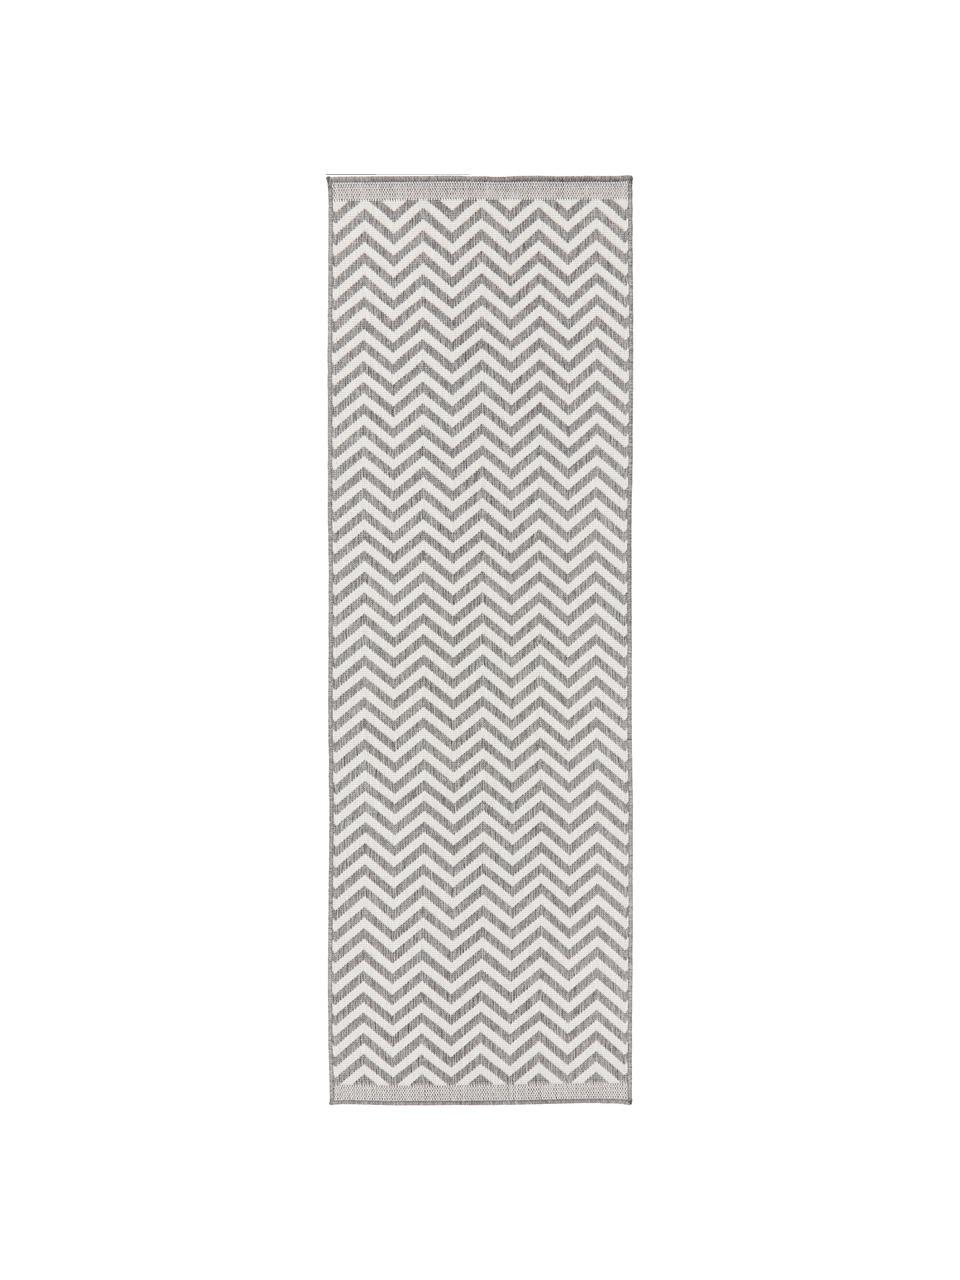 Passatoia reversibile da interno-esterno Palma, Grigio, crema, Larg. 80 x Lung. 350 cm